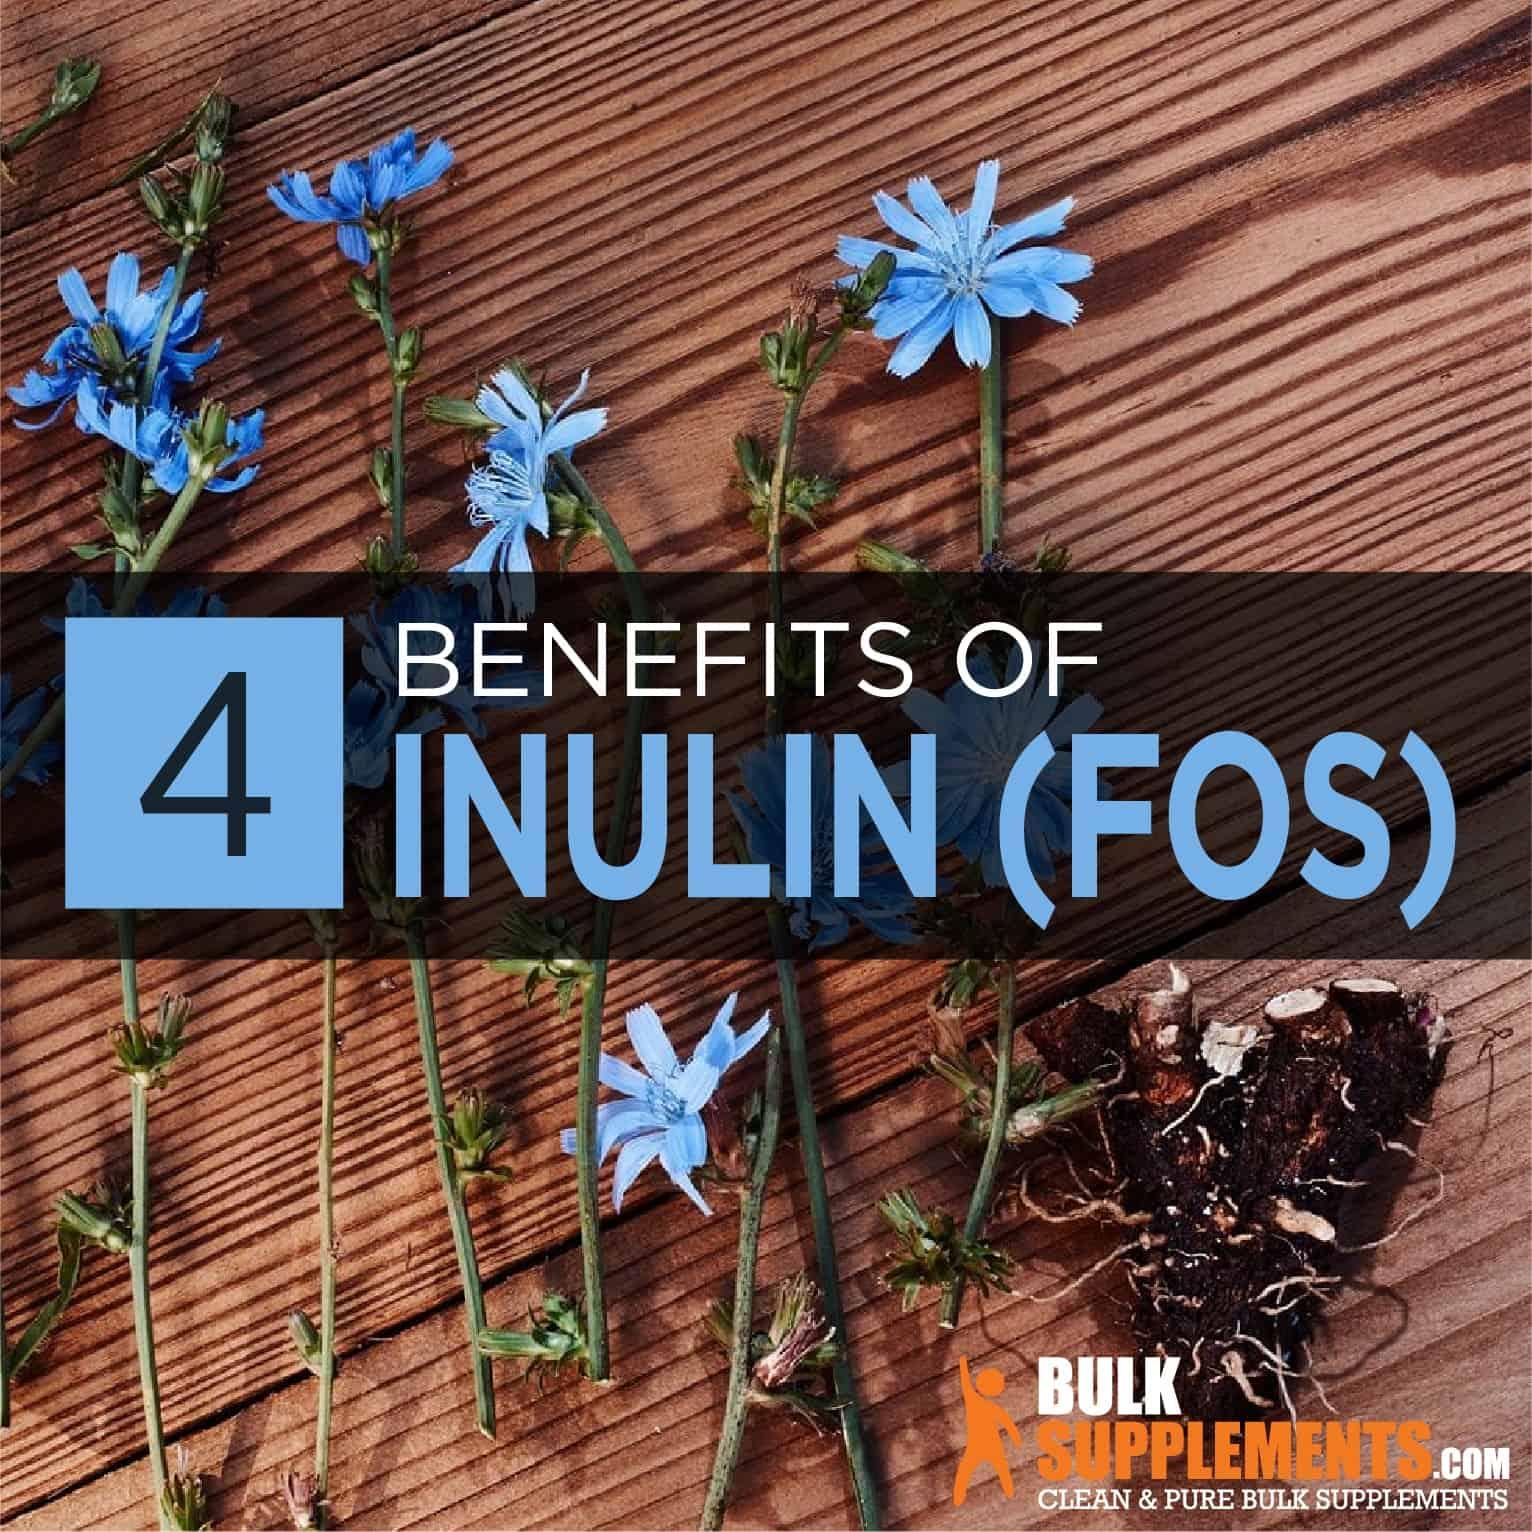 Inulin (FOS)